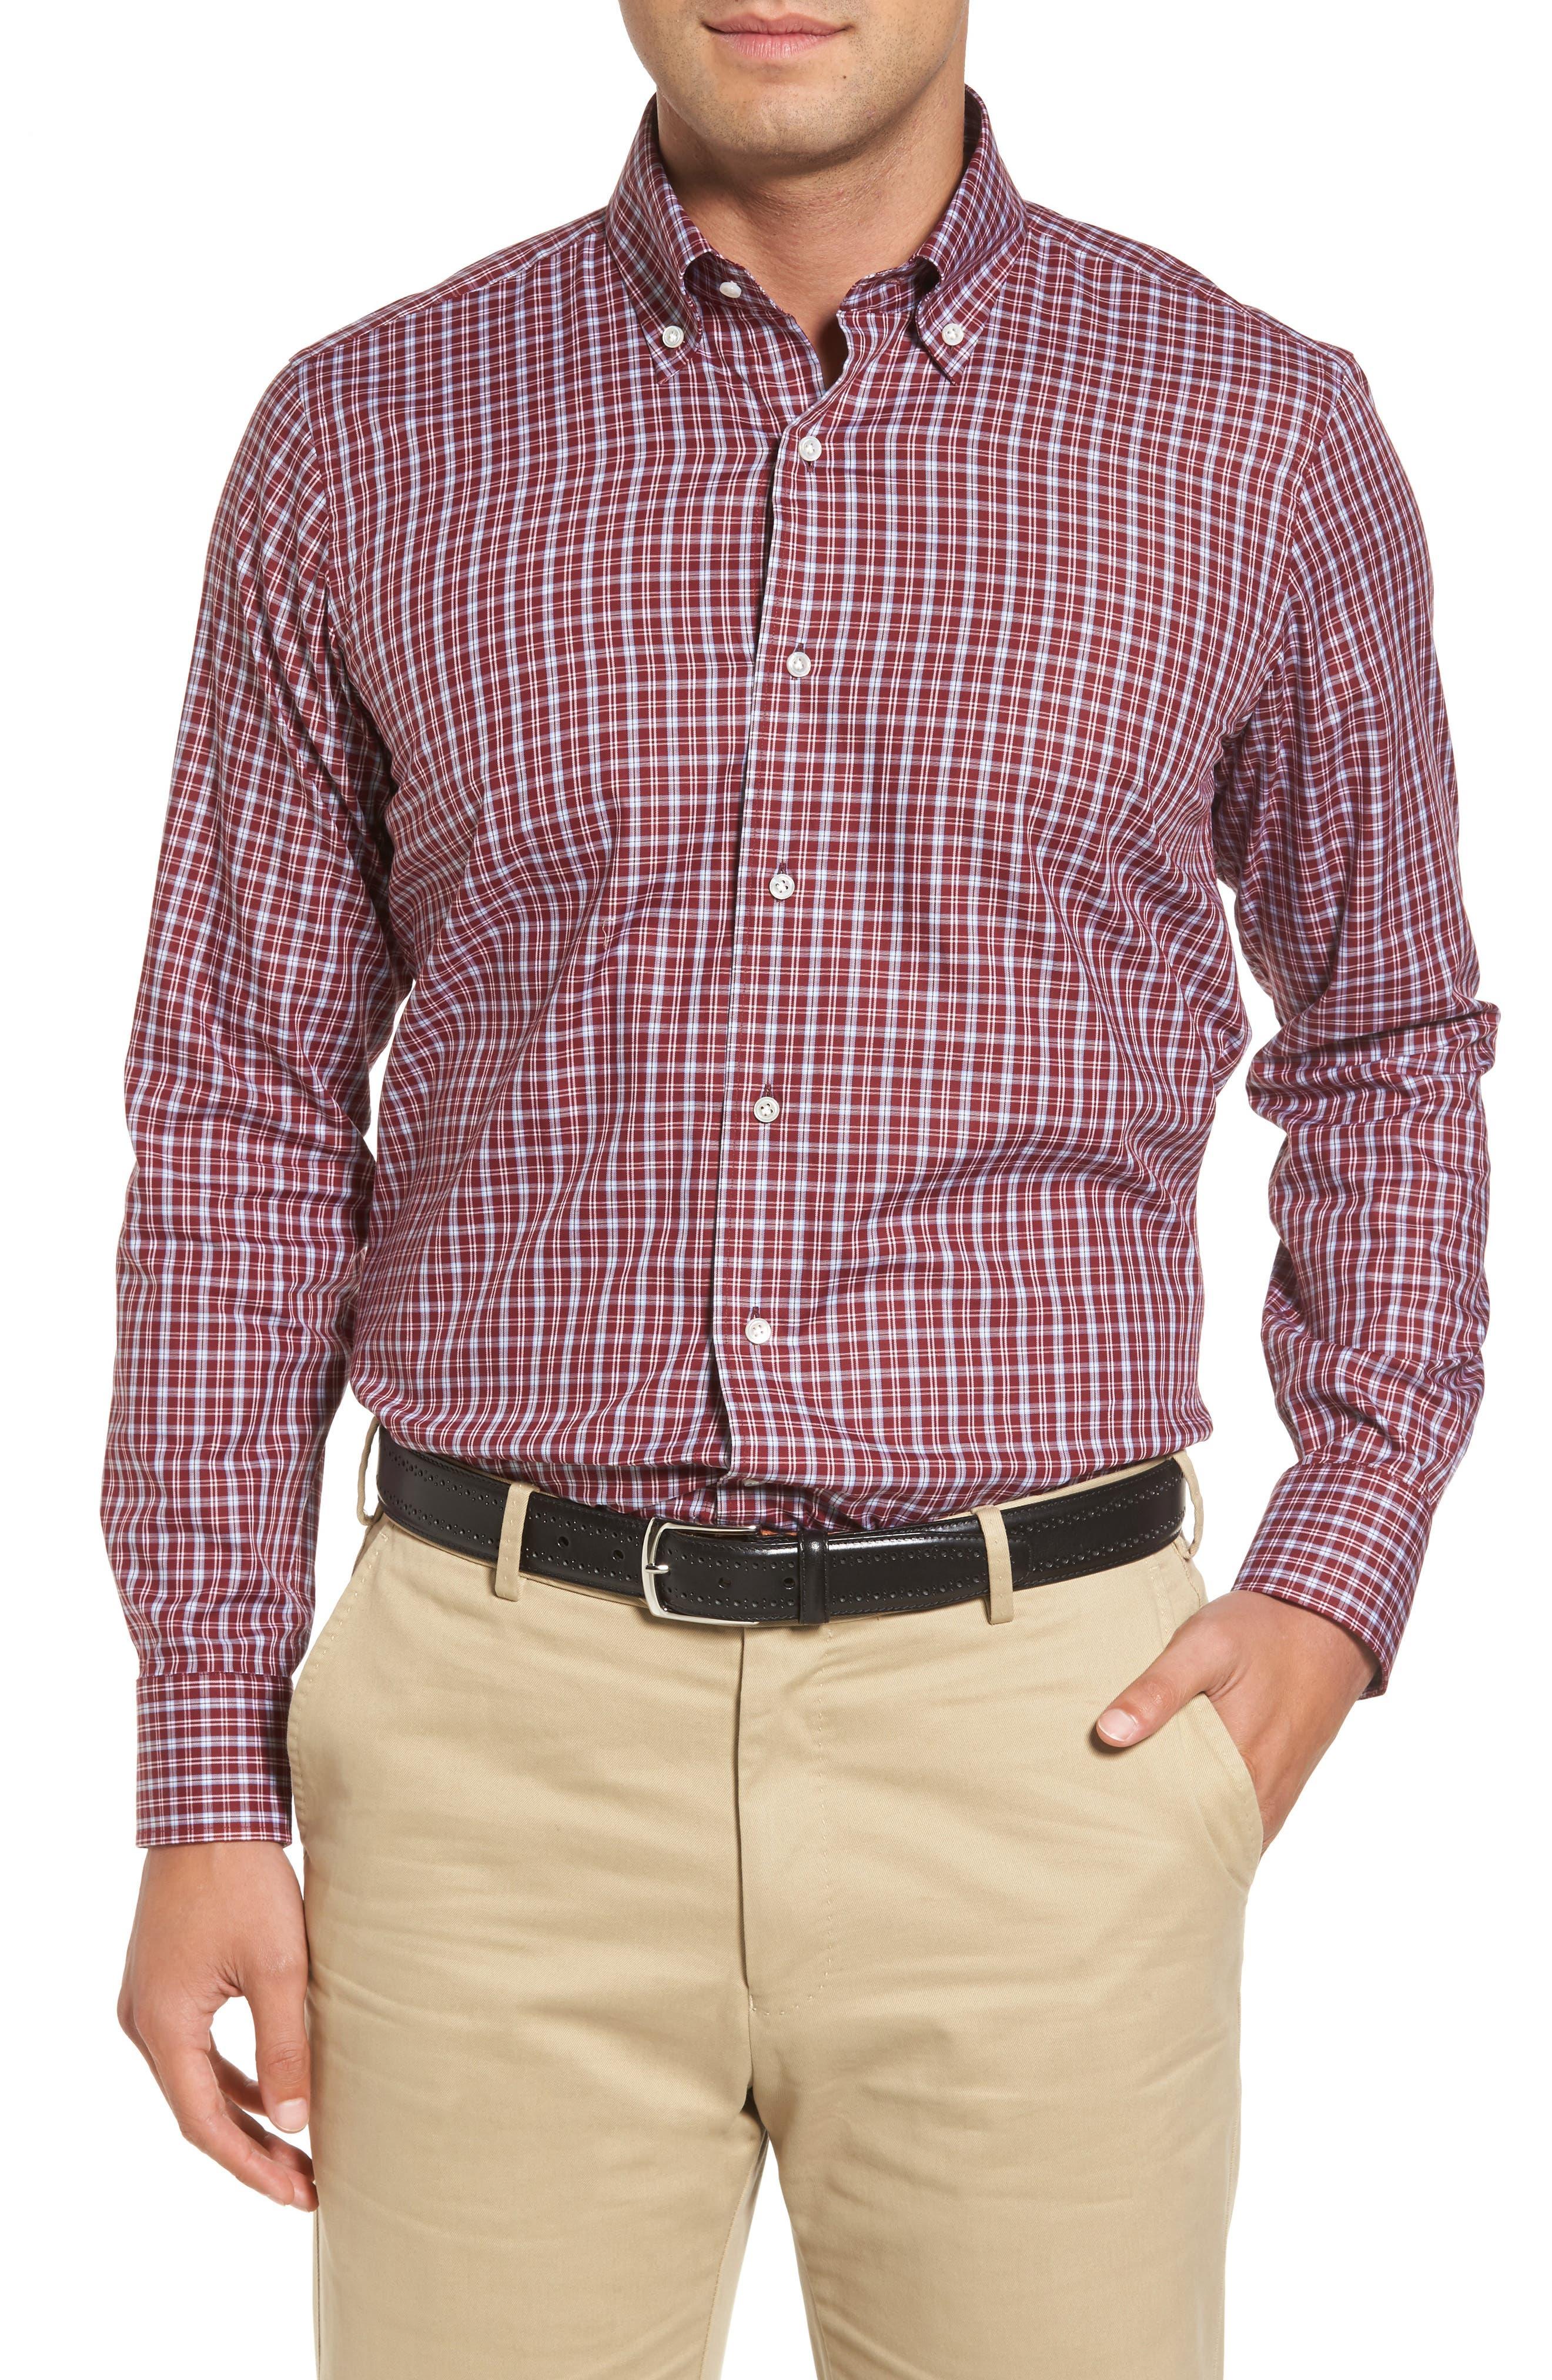 Alternate Image 1 Selected - Peter Millar Isle Check Regular Fit Sport Shirt